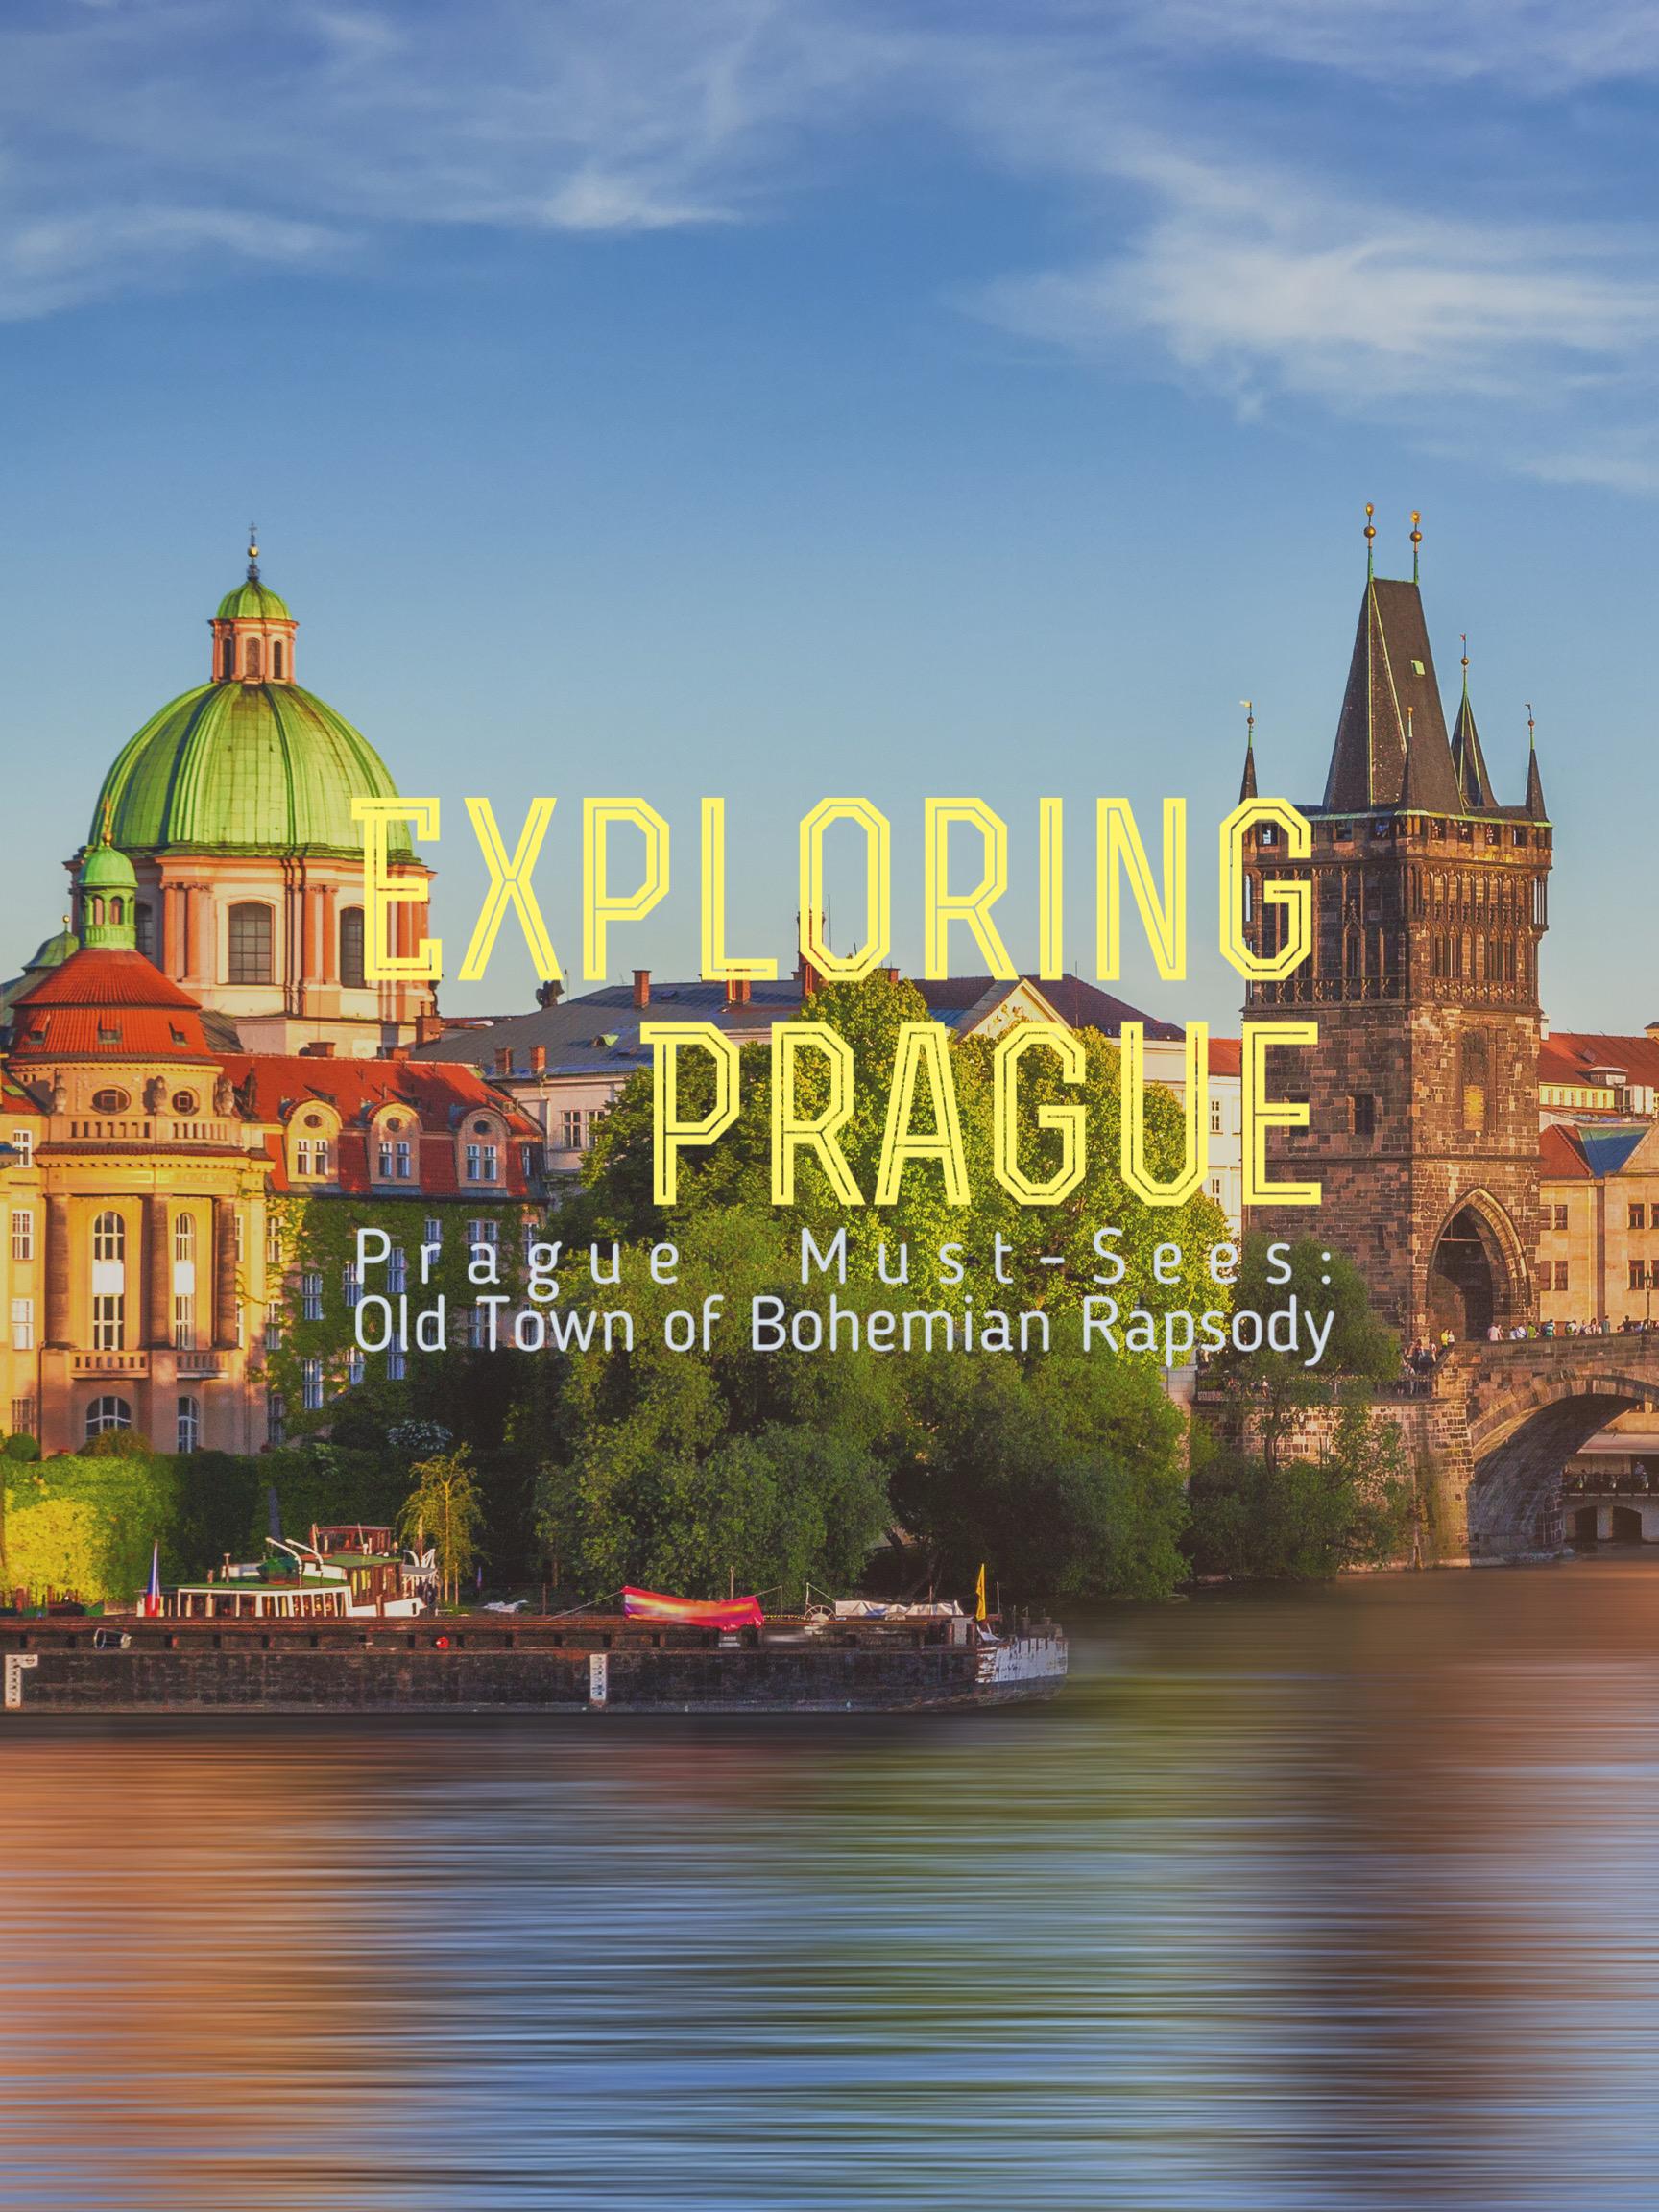 Exploring Prague: Old Town of Bohemian Rapsody